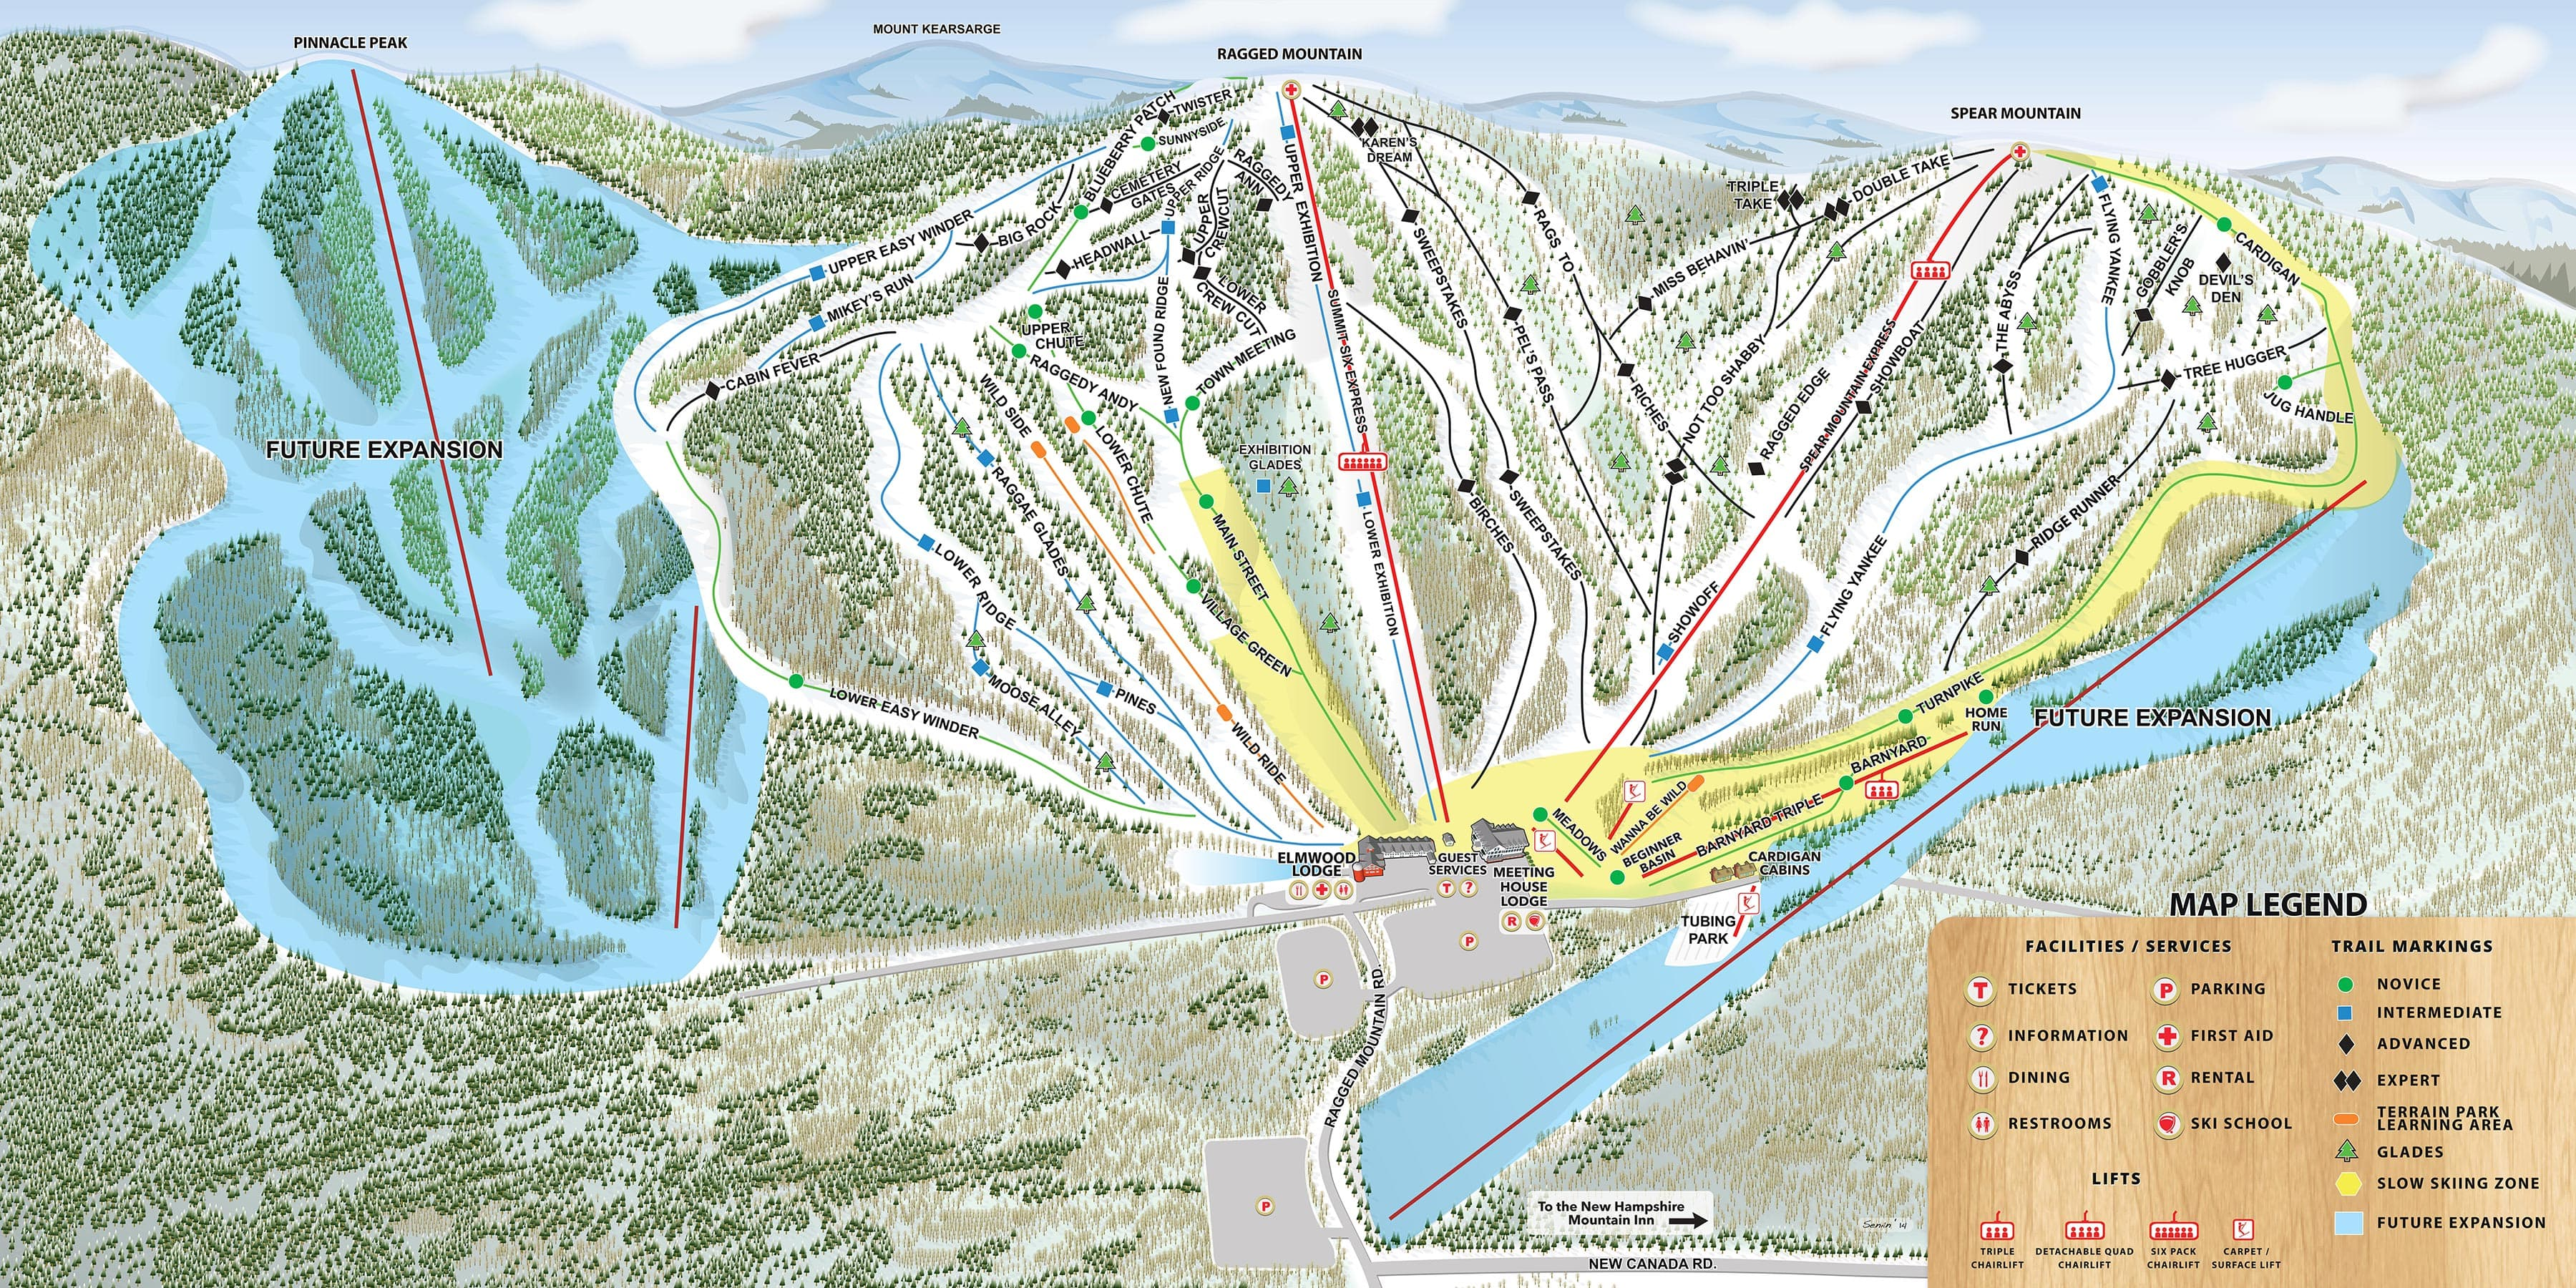 Ragged Mountain Resort Piste / Trail Map